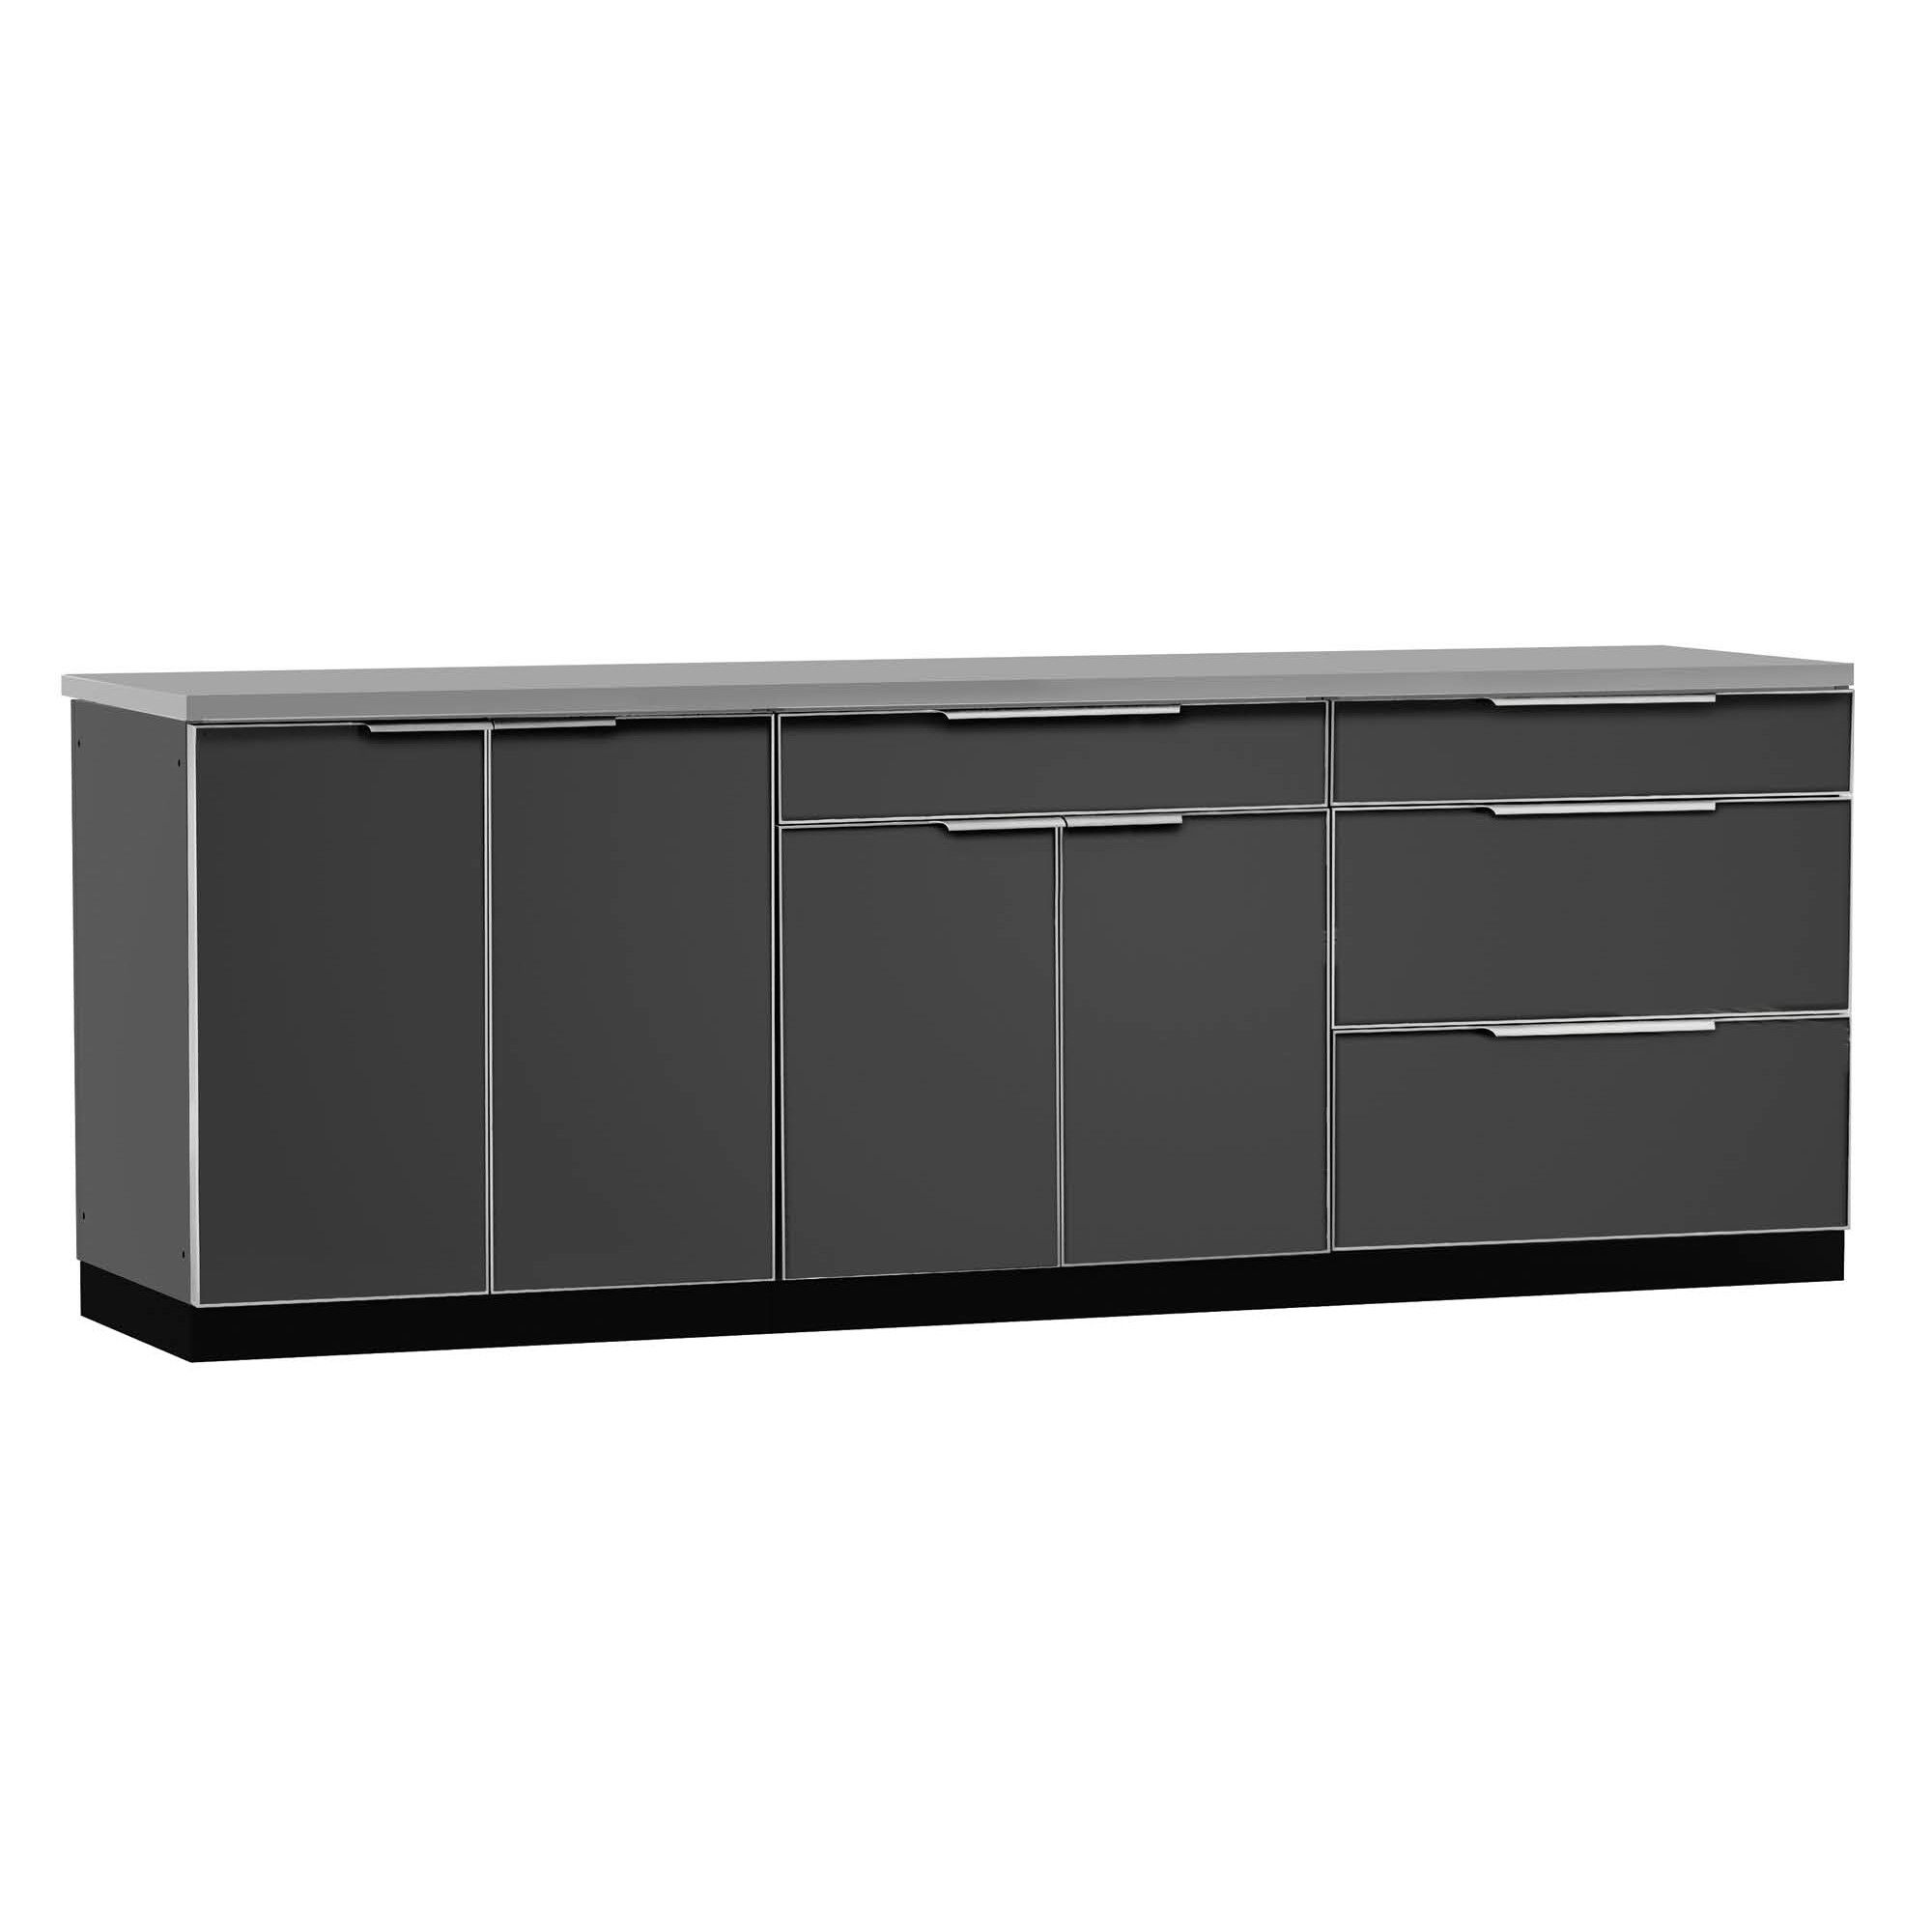 Stainless steel bar center 3piece modular outdoor kitchen